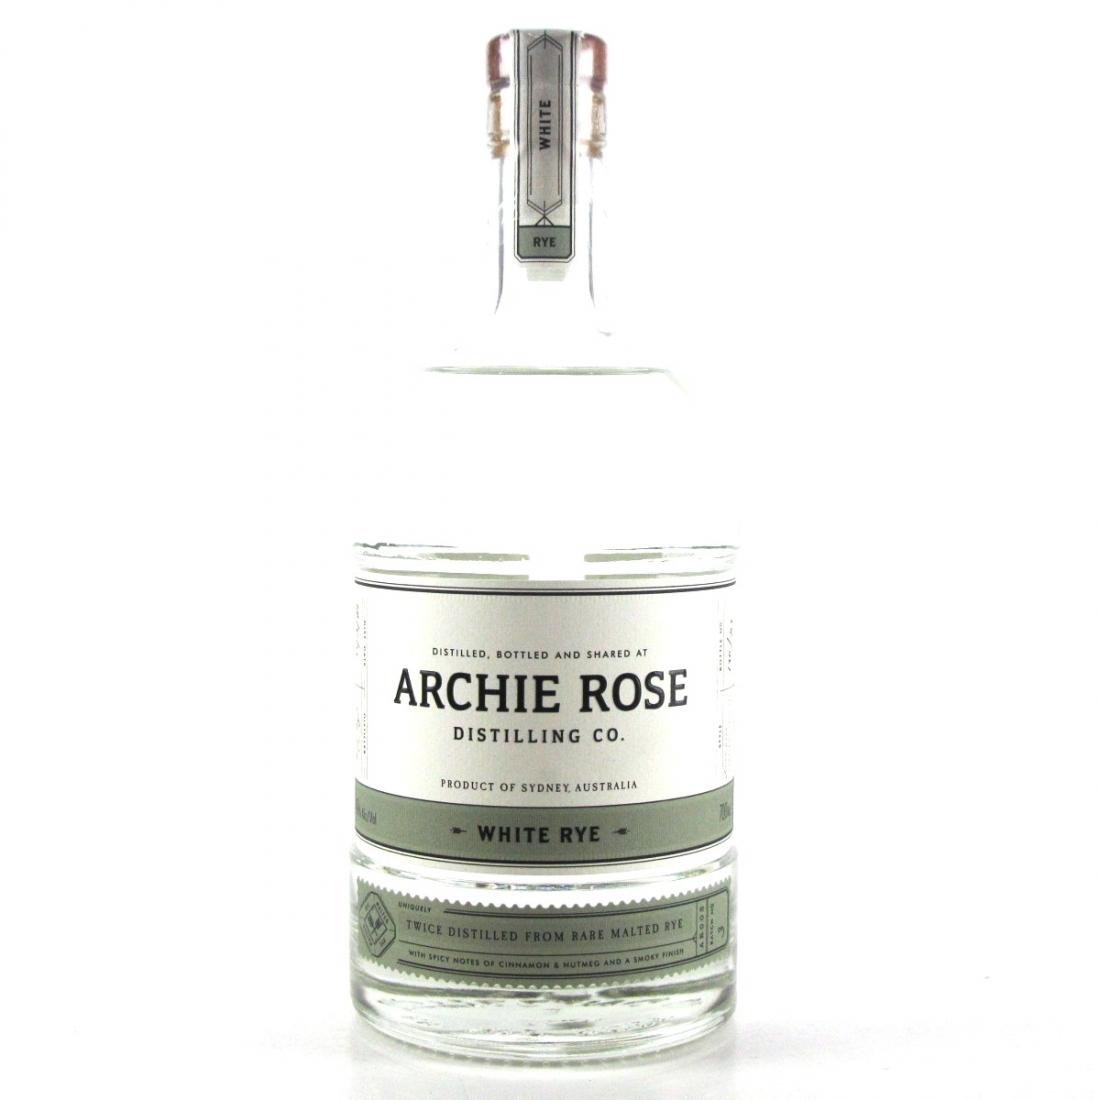 Archie Rose White Rye